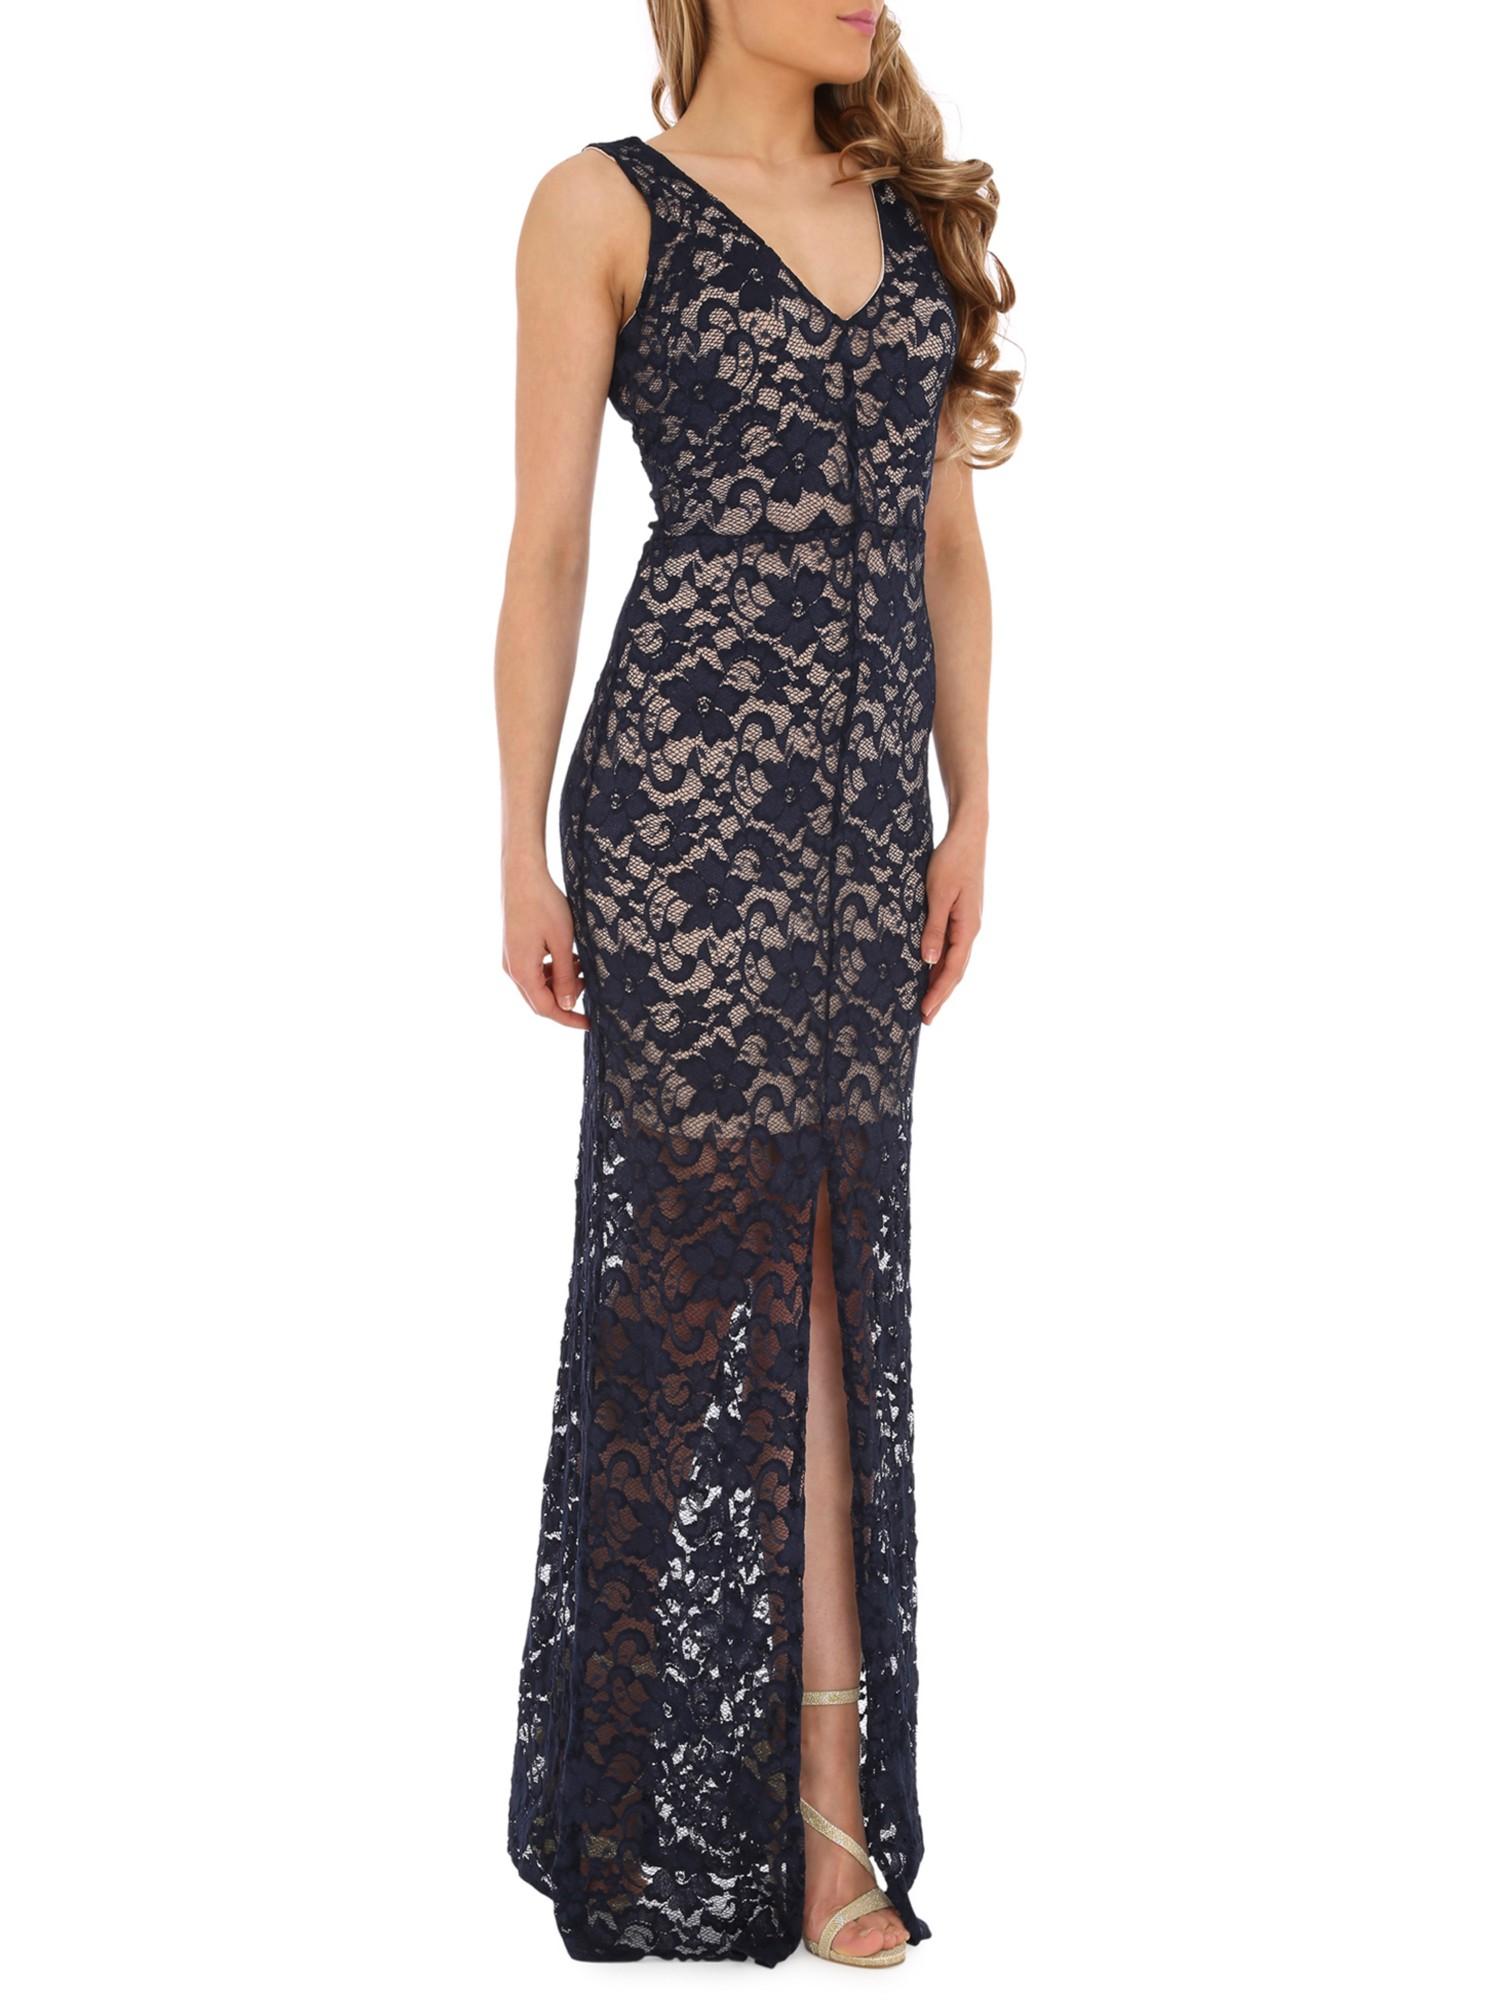 Belle By Badgley Mischka Lace Maxi Dress in Blue - Lyst